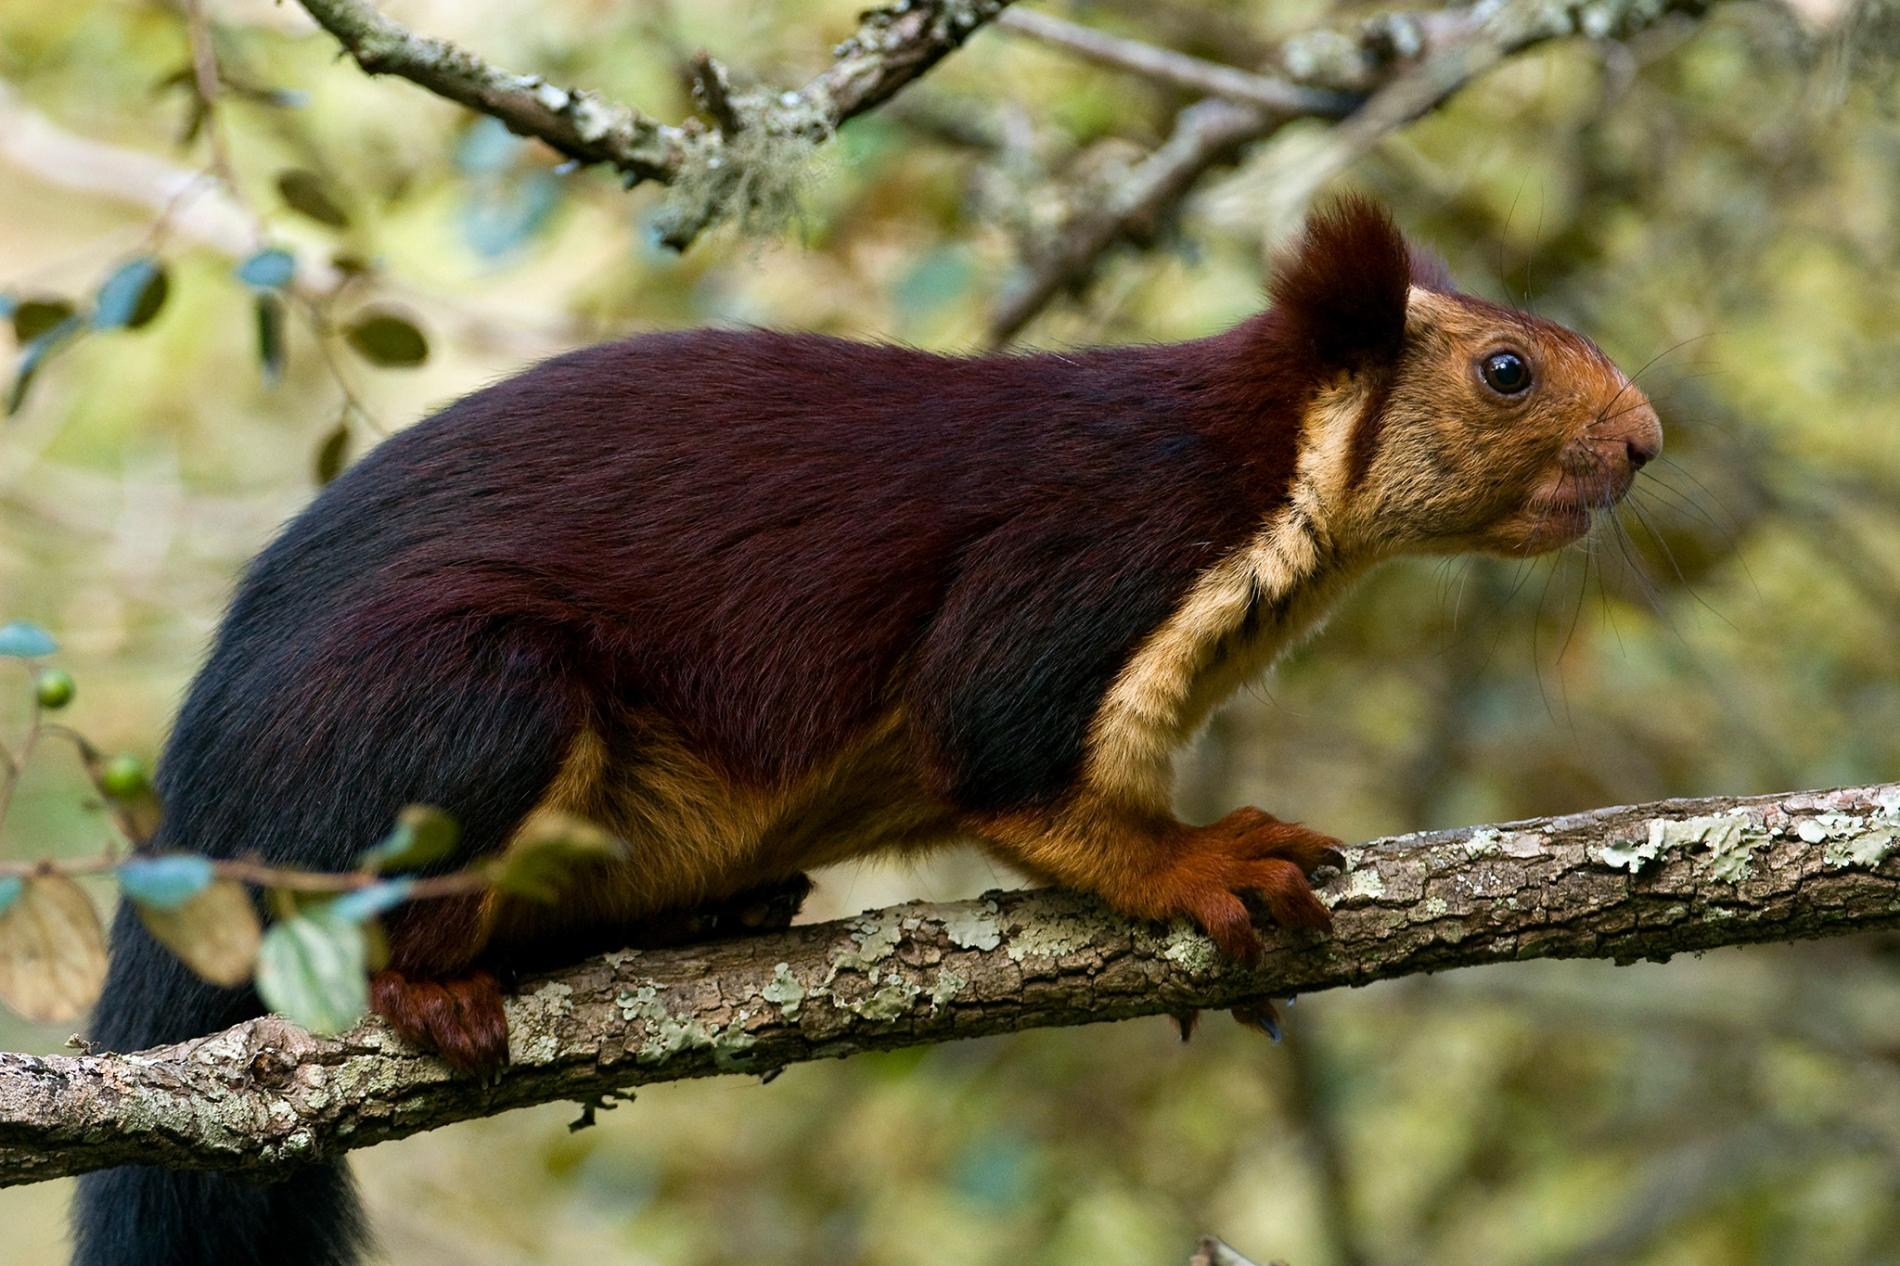 印度巨松鼠(Ratufa indica)體長能達到約46公分。PHOTOGRAPH BY AXEL GOMILLE, MINDEN PICTURES AXEL GOMILLE AXEL GOMILLE AXEL GOMILLE